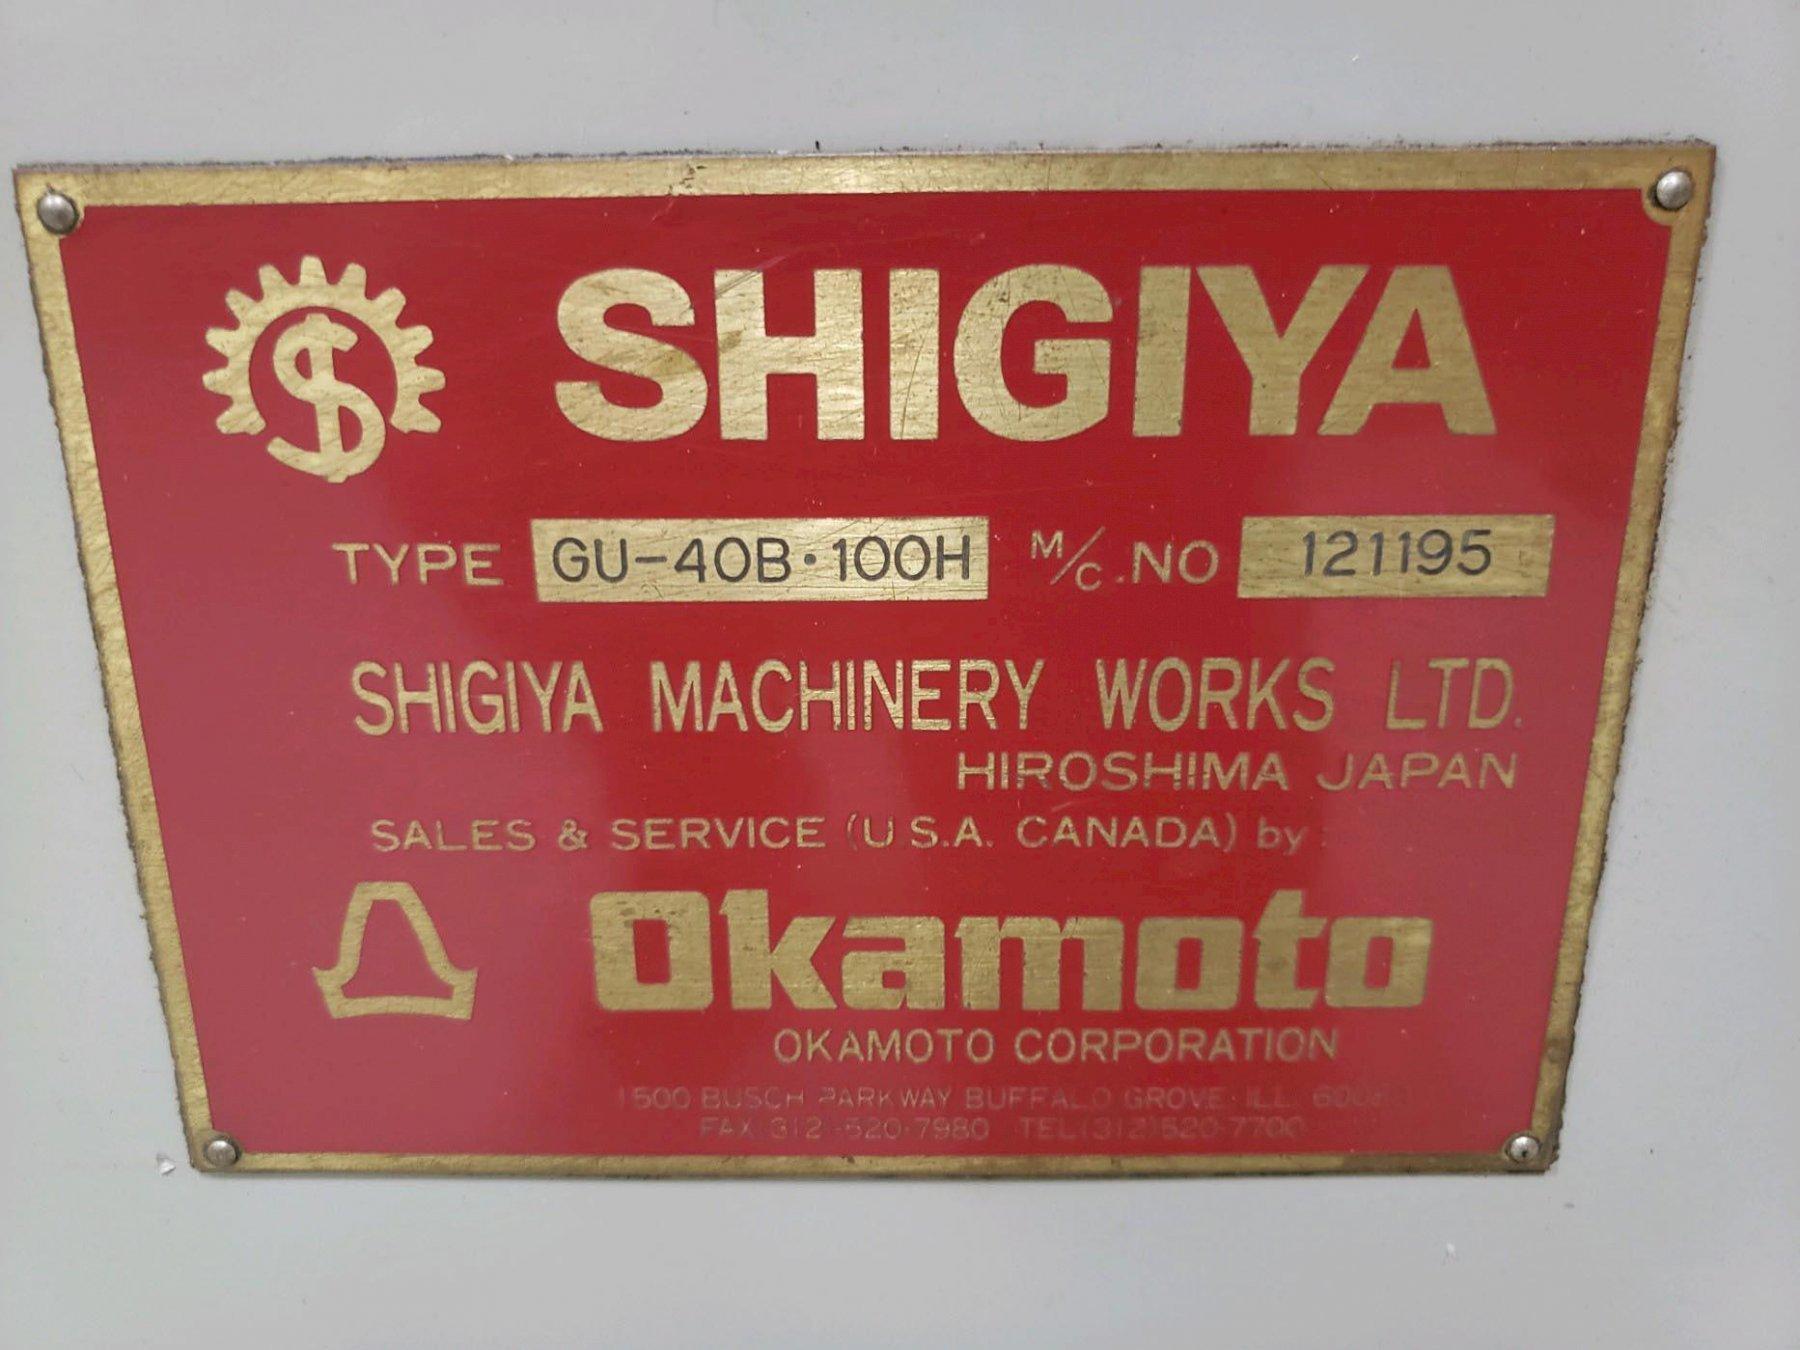 "16"" x 36"" SHIGIYA UNIVERSAL, 16"" Swing, 36"" Centers, Swing Down ID Spindle, Swivel Workhead, Swivel Wheel Head, VS Workhead, 14"" Diameter Wheel, New 1992."